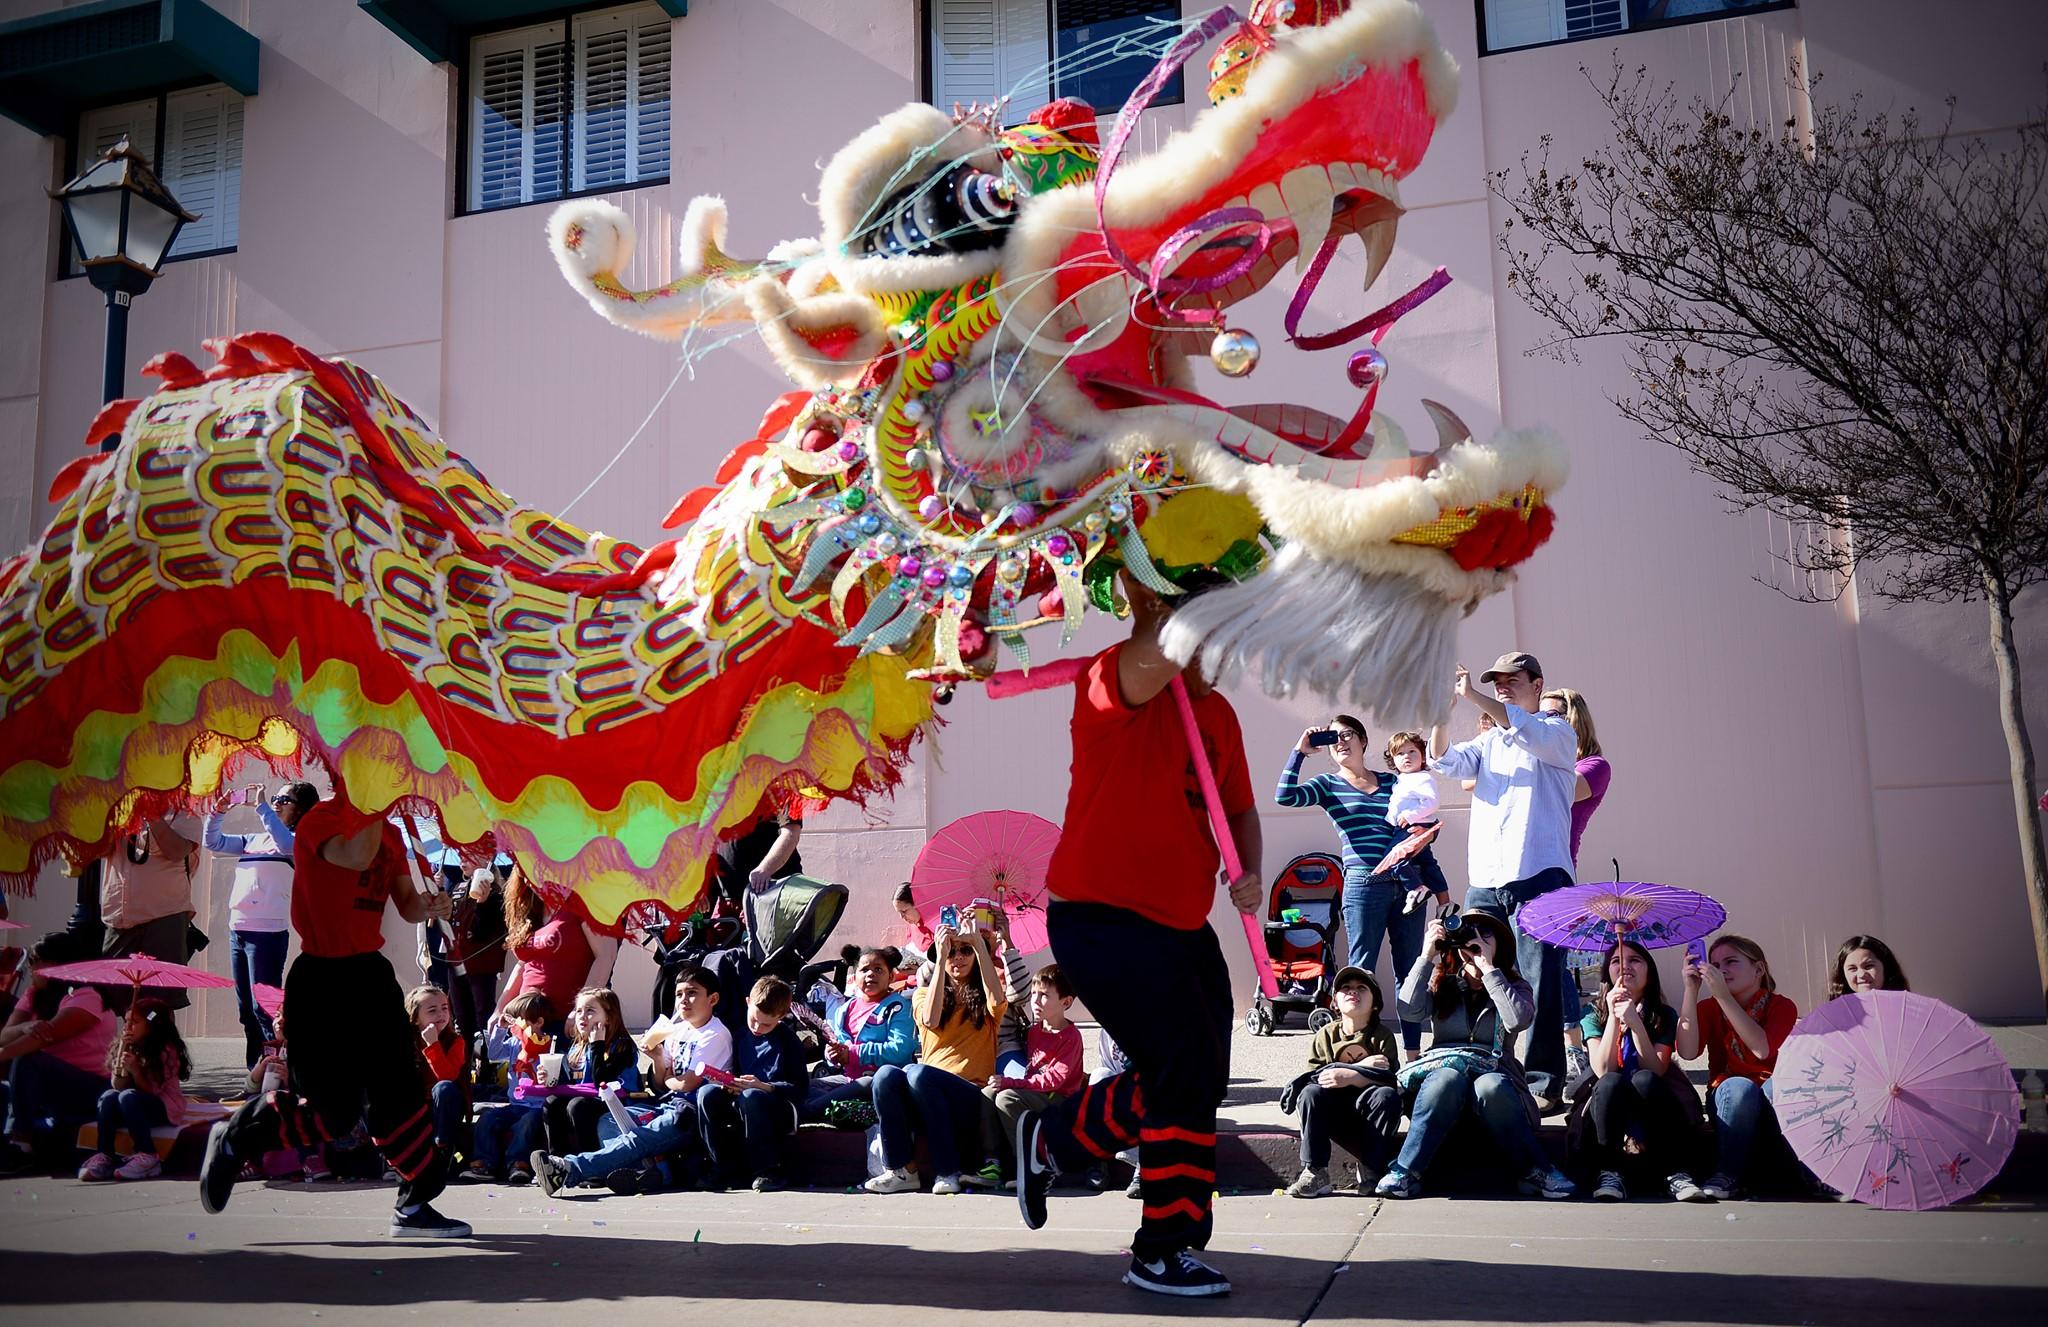 The 121st Golden Dragon Parade